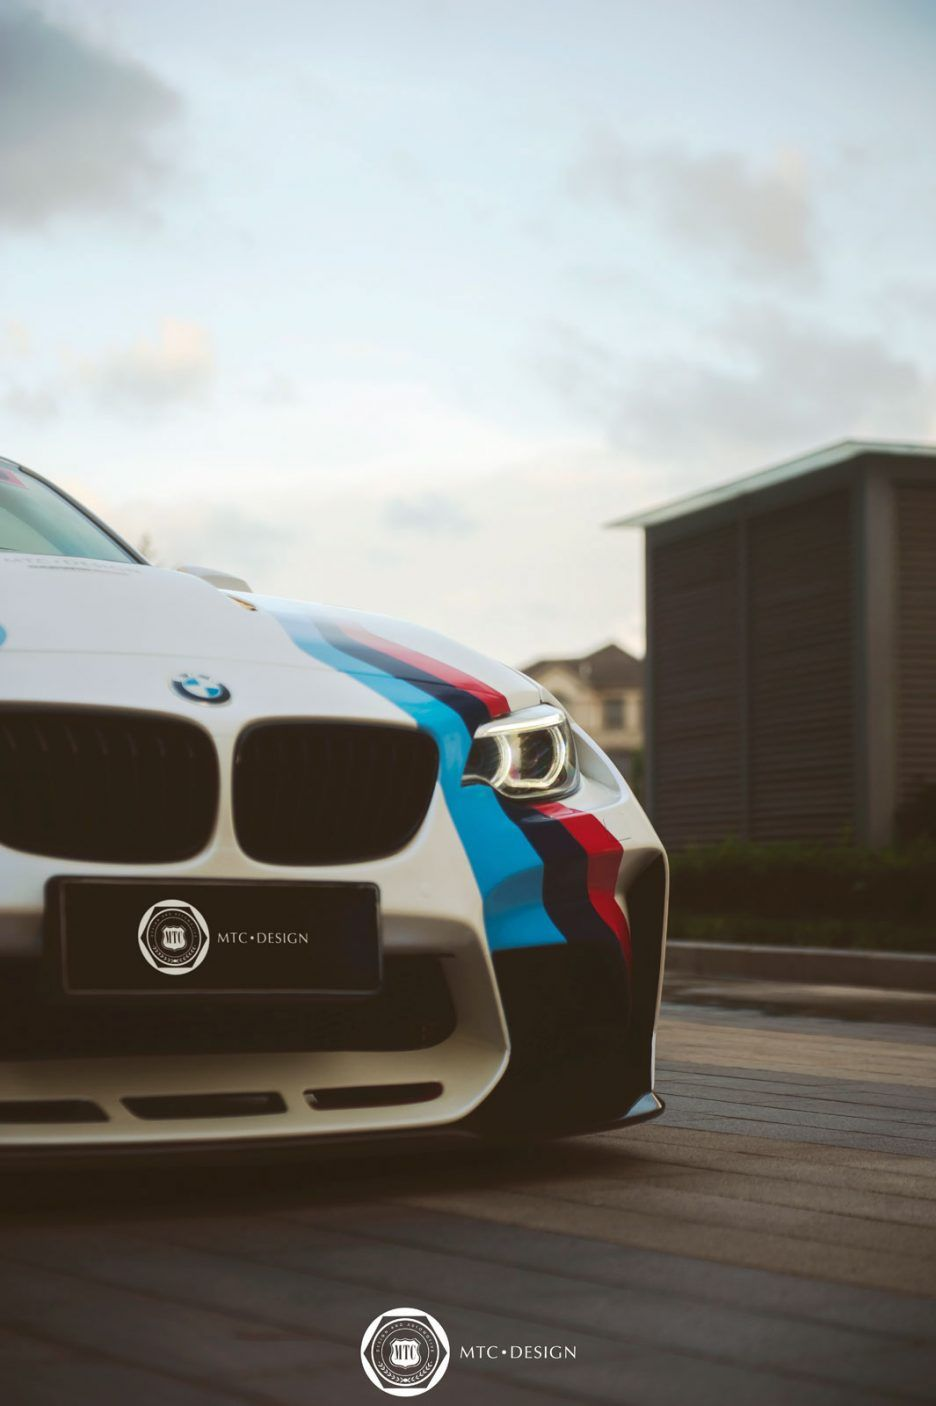 MTC DarwinPro BMW M2 Vision GT Exterior Front Details